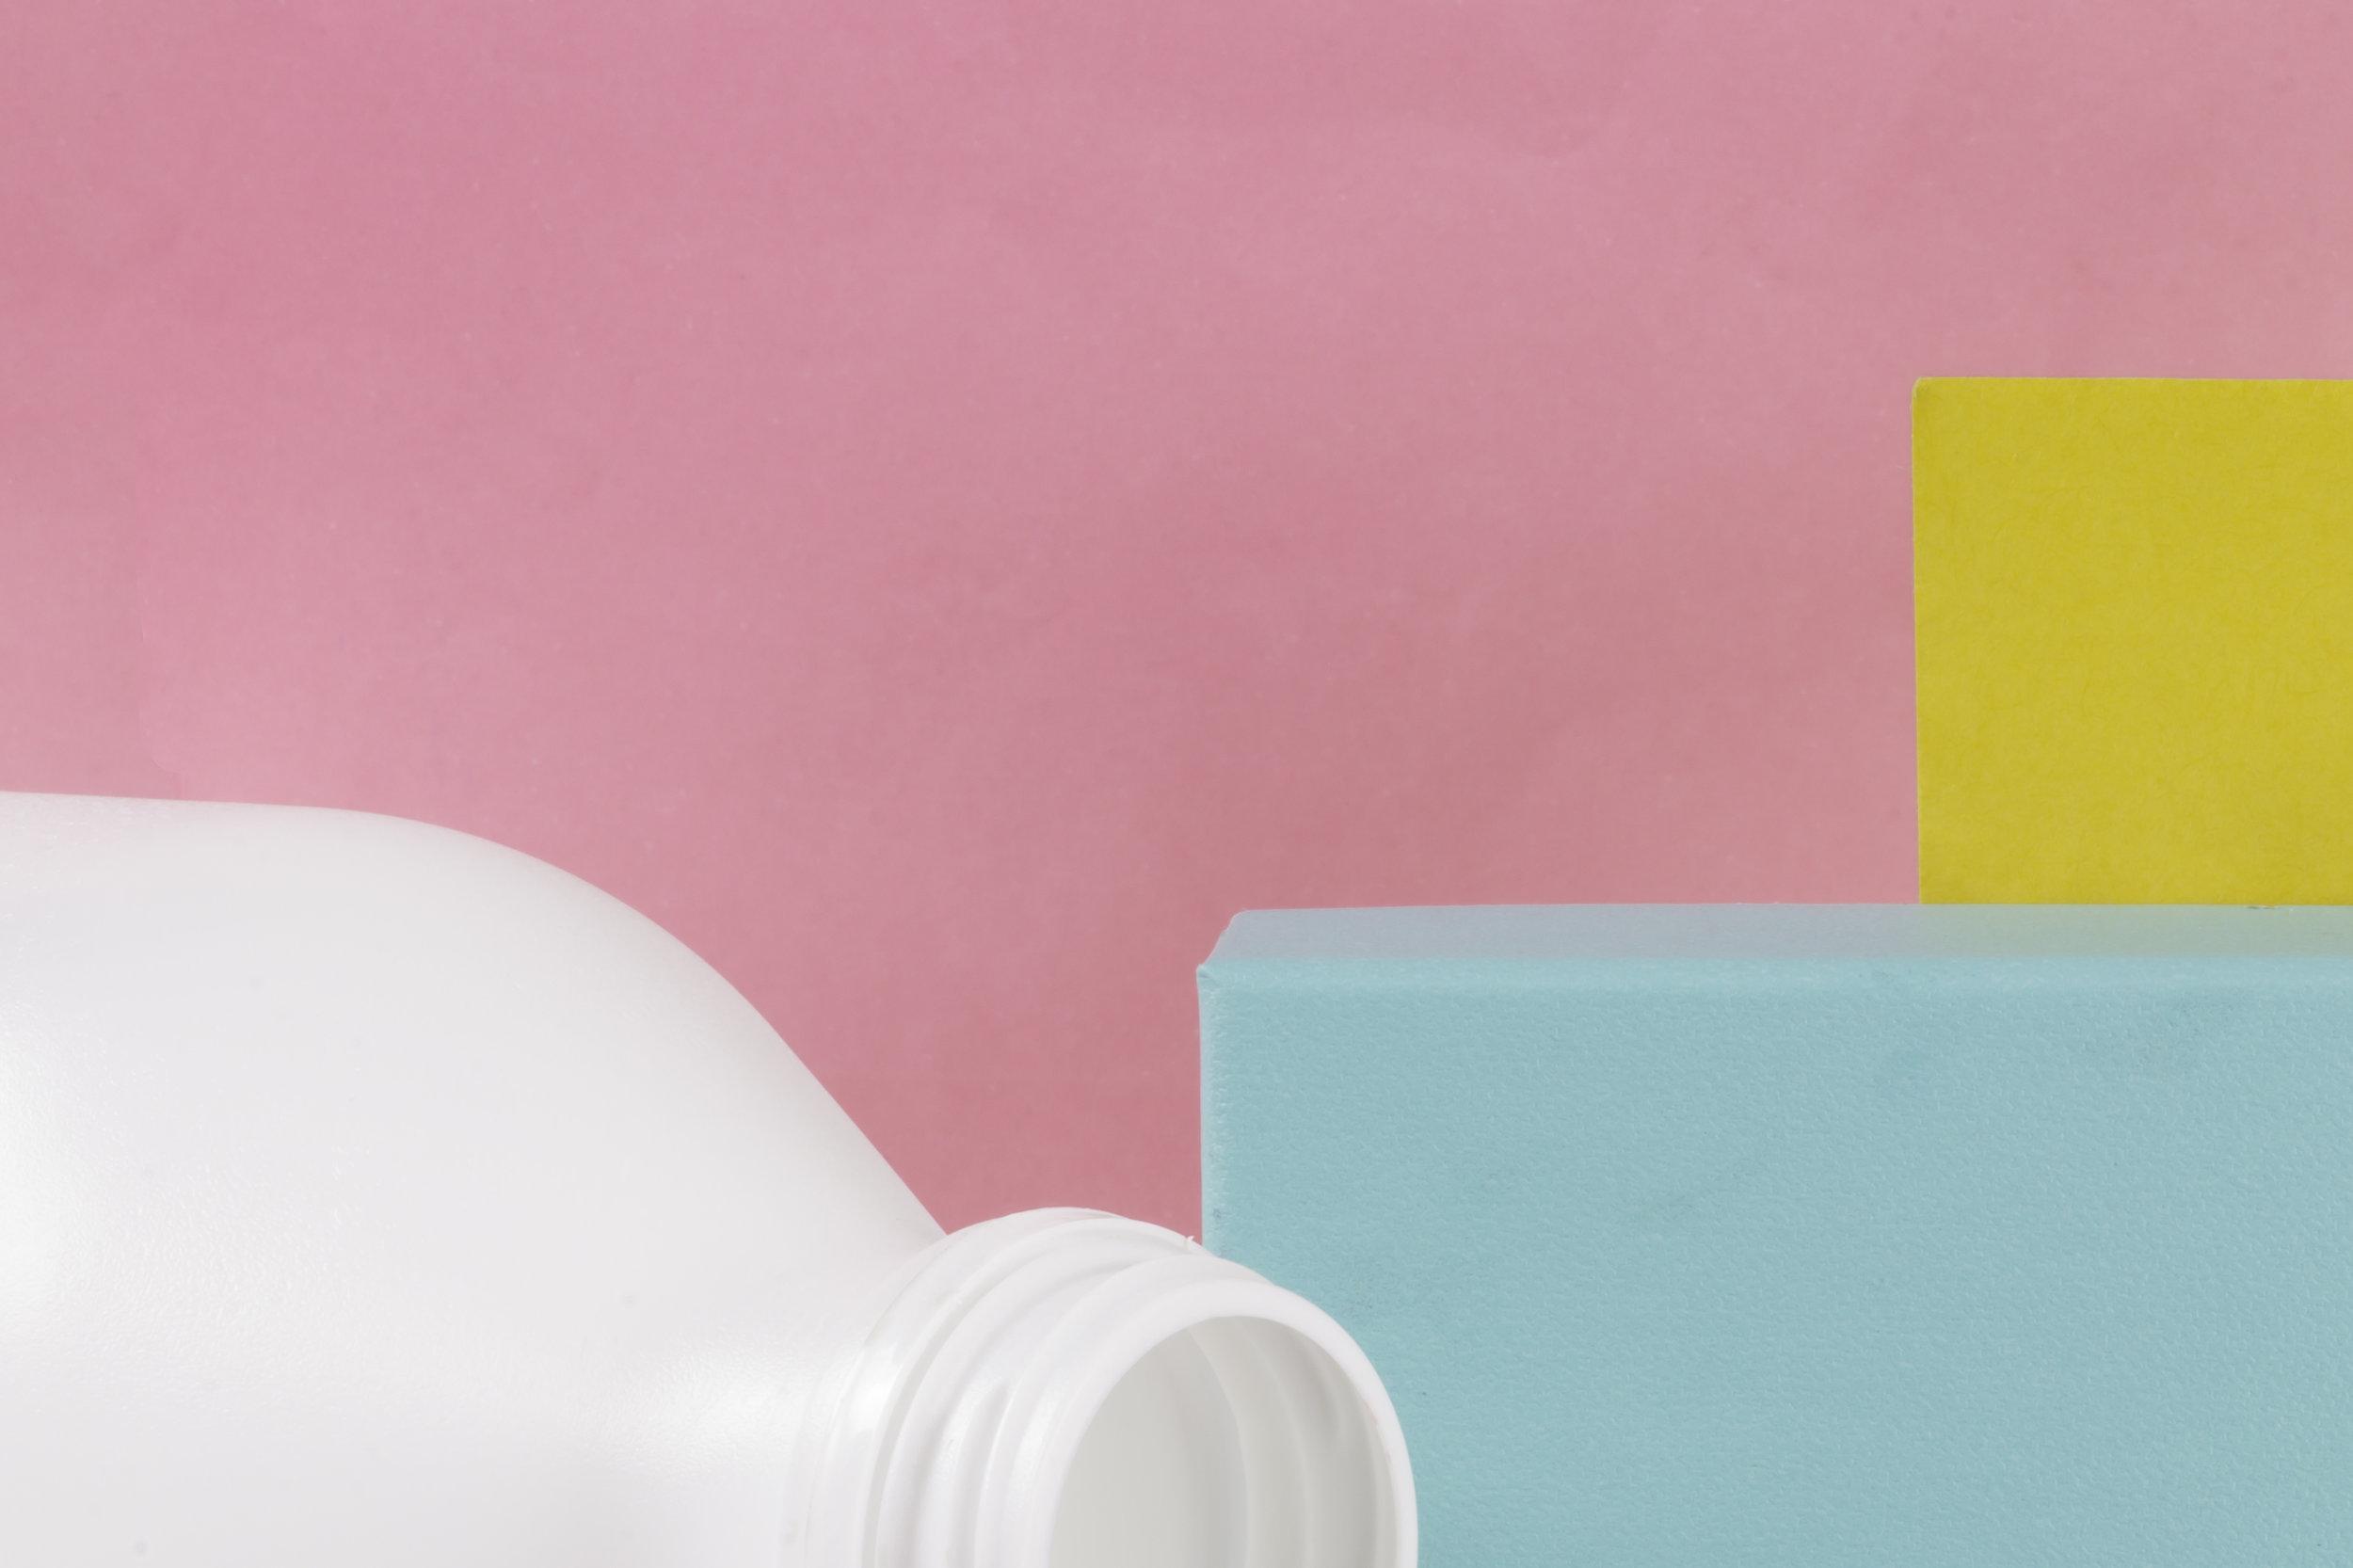 _MG_5336_ACG_untitled image_2017_tri-color-yogurt-bottle.jpg